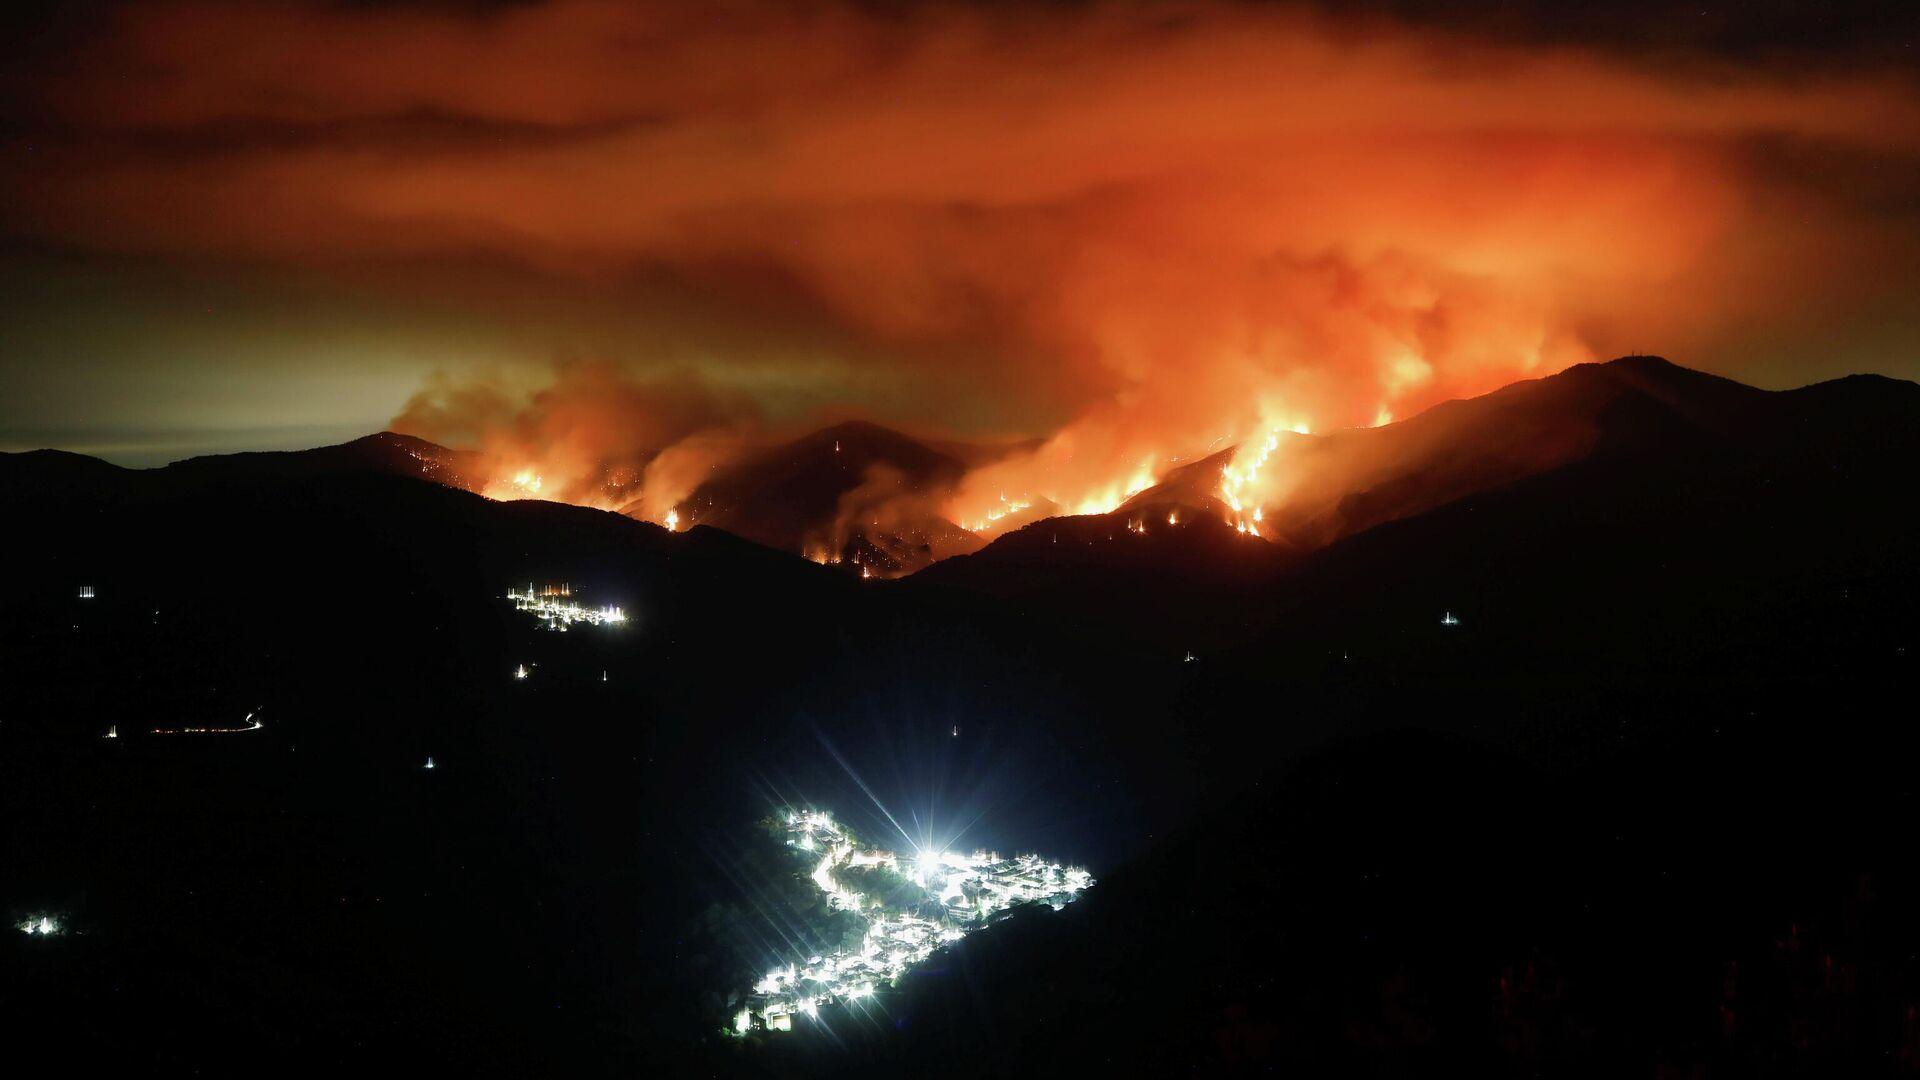 Incendios forestales en Sierra Bermeja, España - Sputnik Mundo, 1920, 14.09.2021